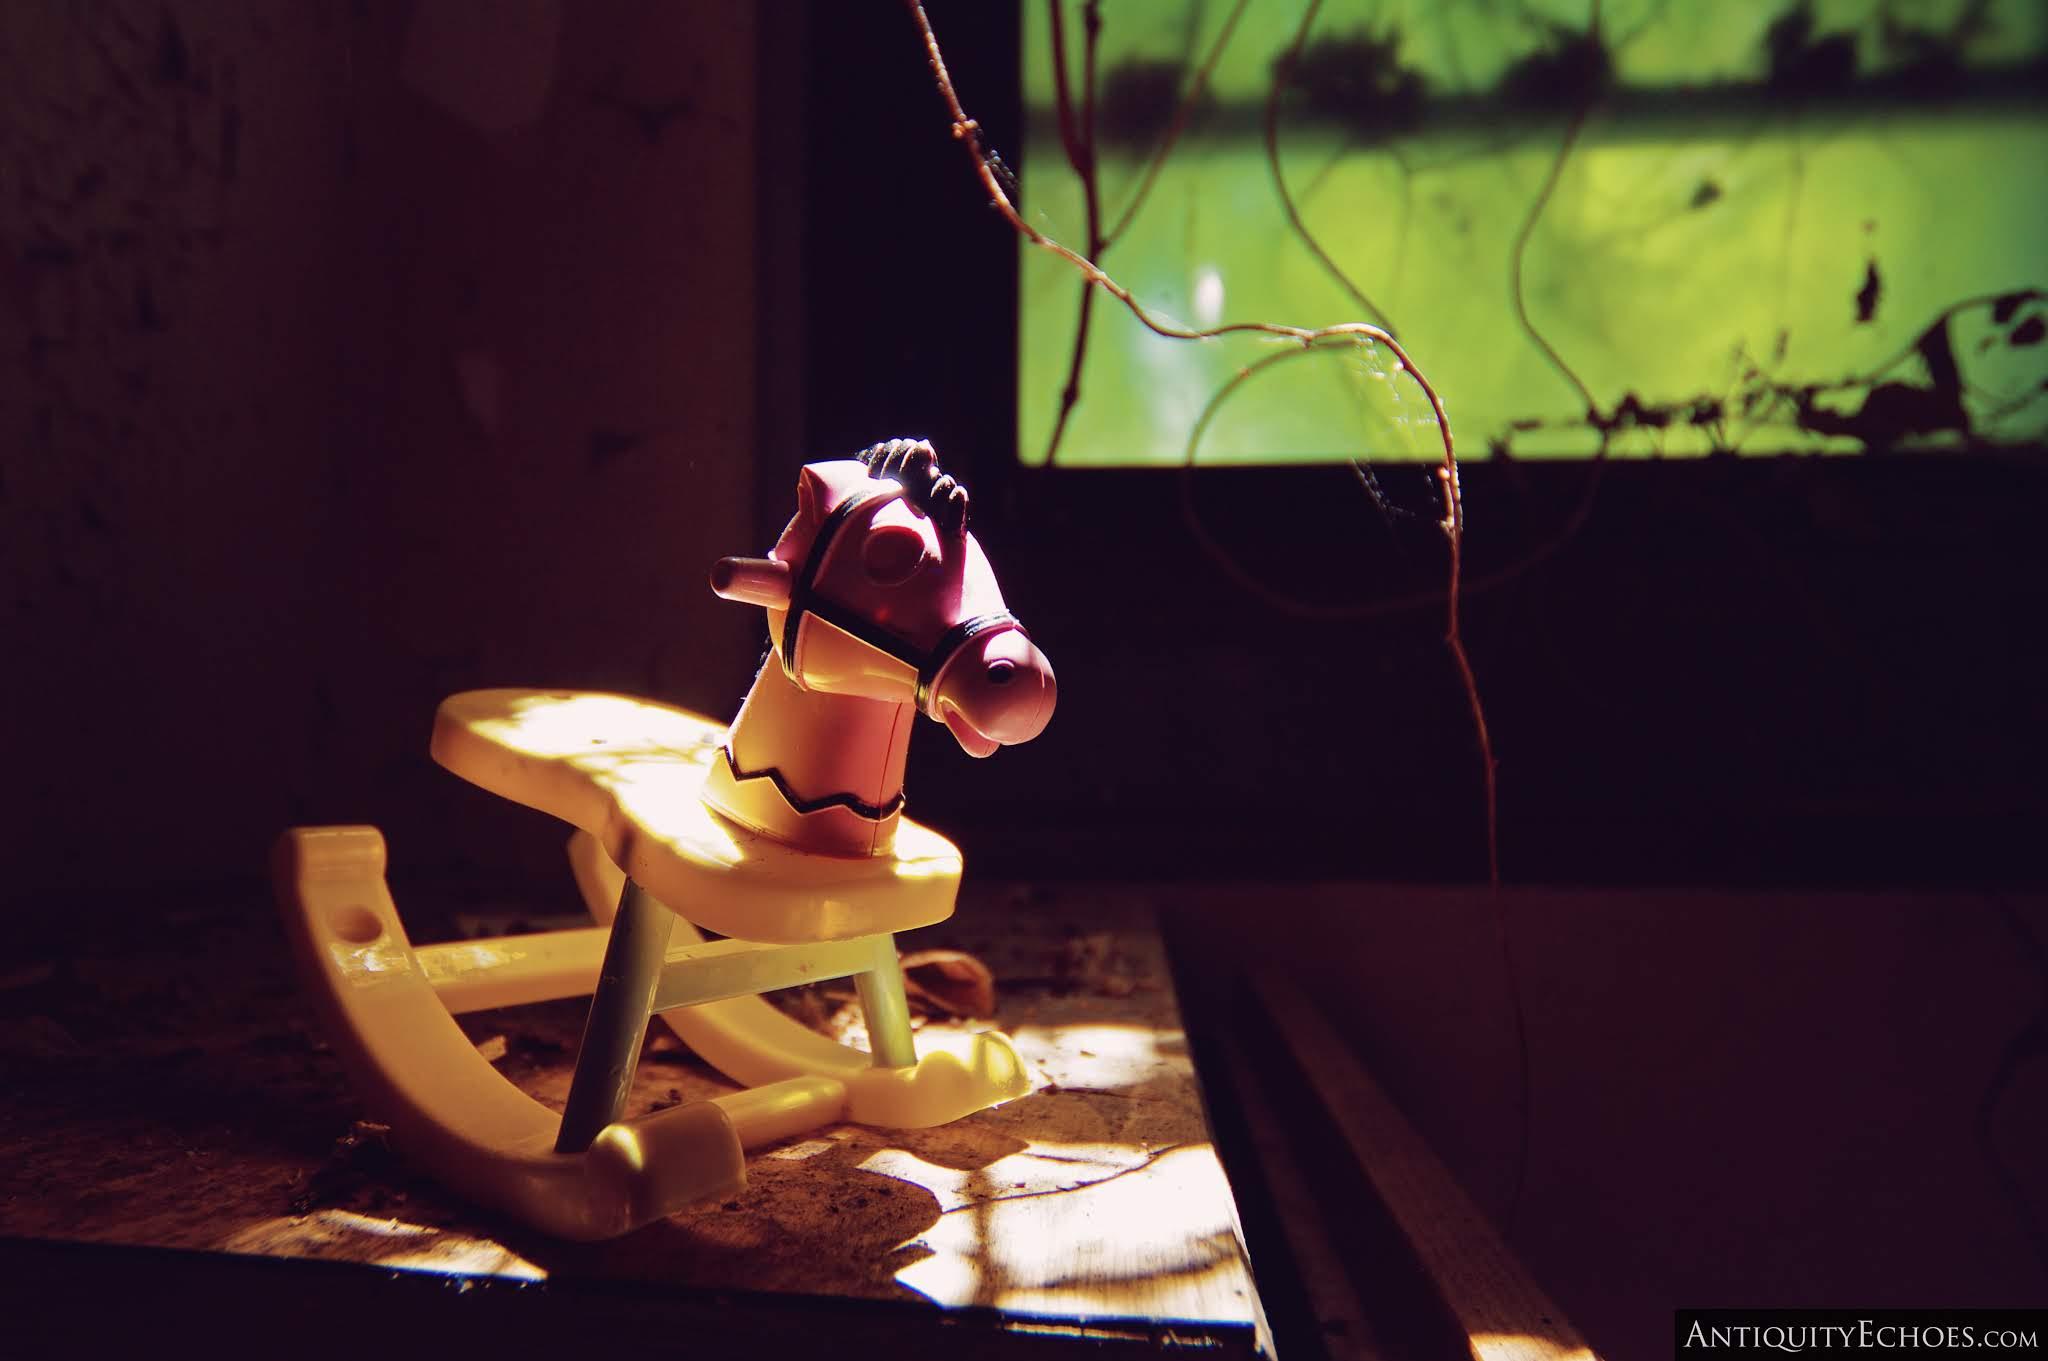 Overbrook Asylum - A Forgotten Toy